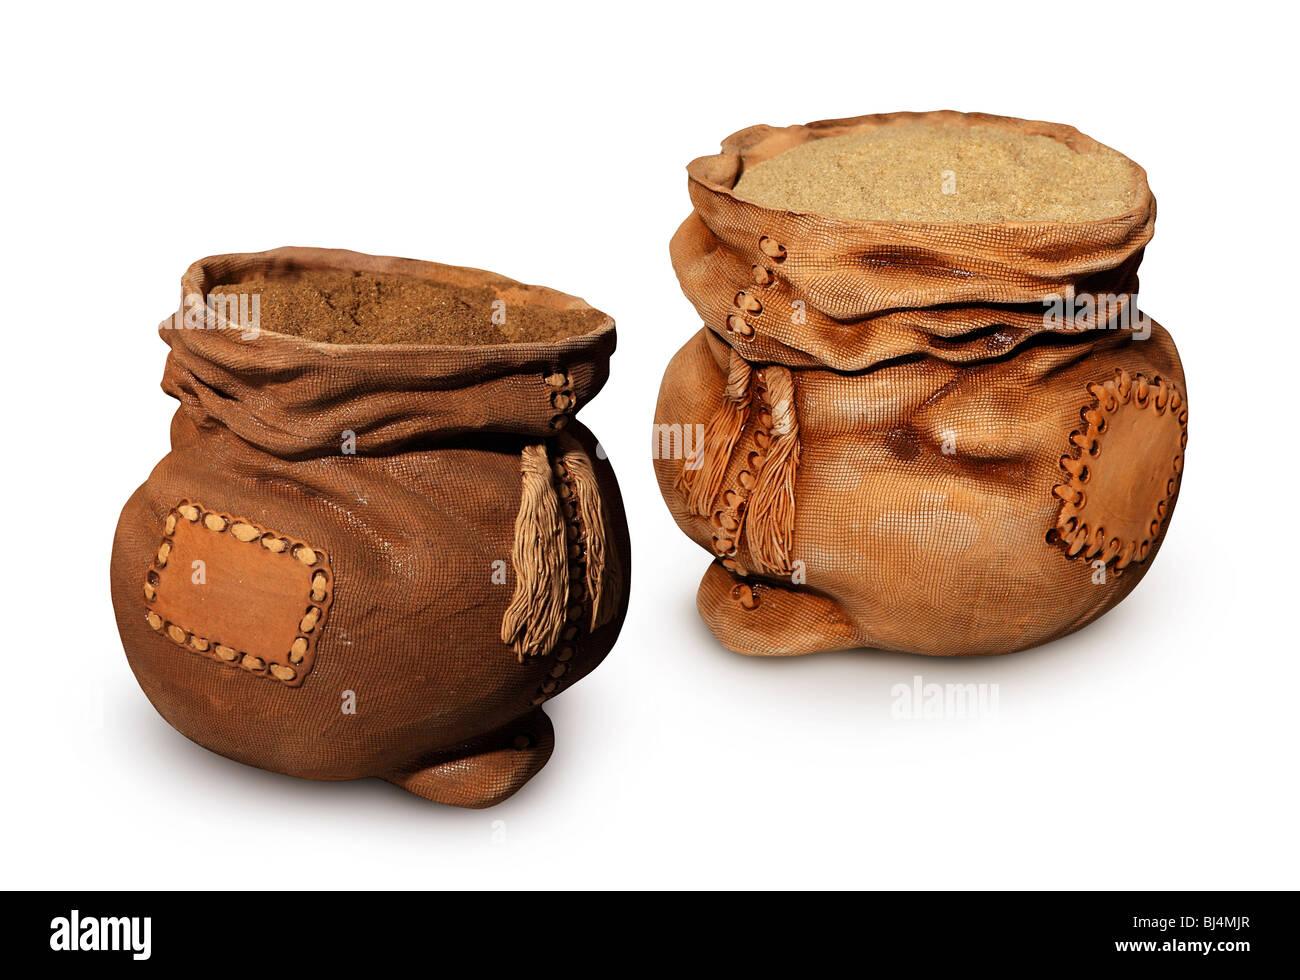 Decorative ceramic sacks full of dark and light meal isolated on white background - Stock Image